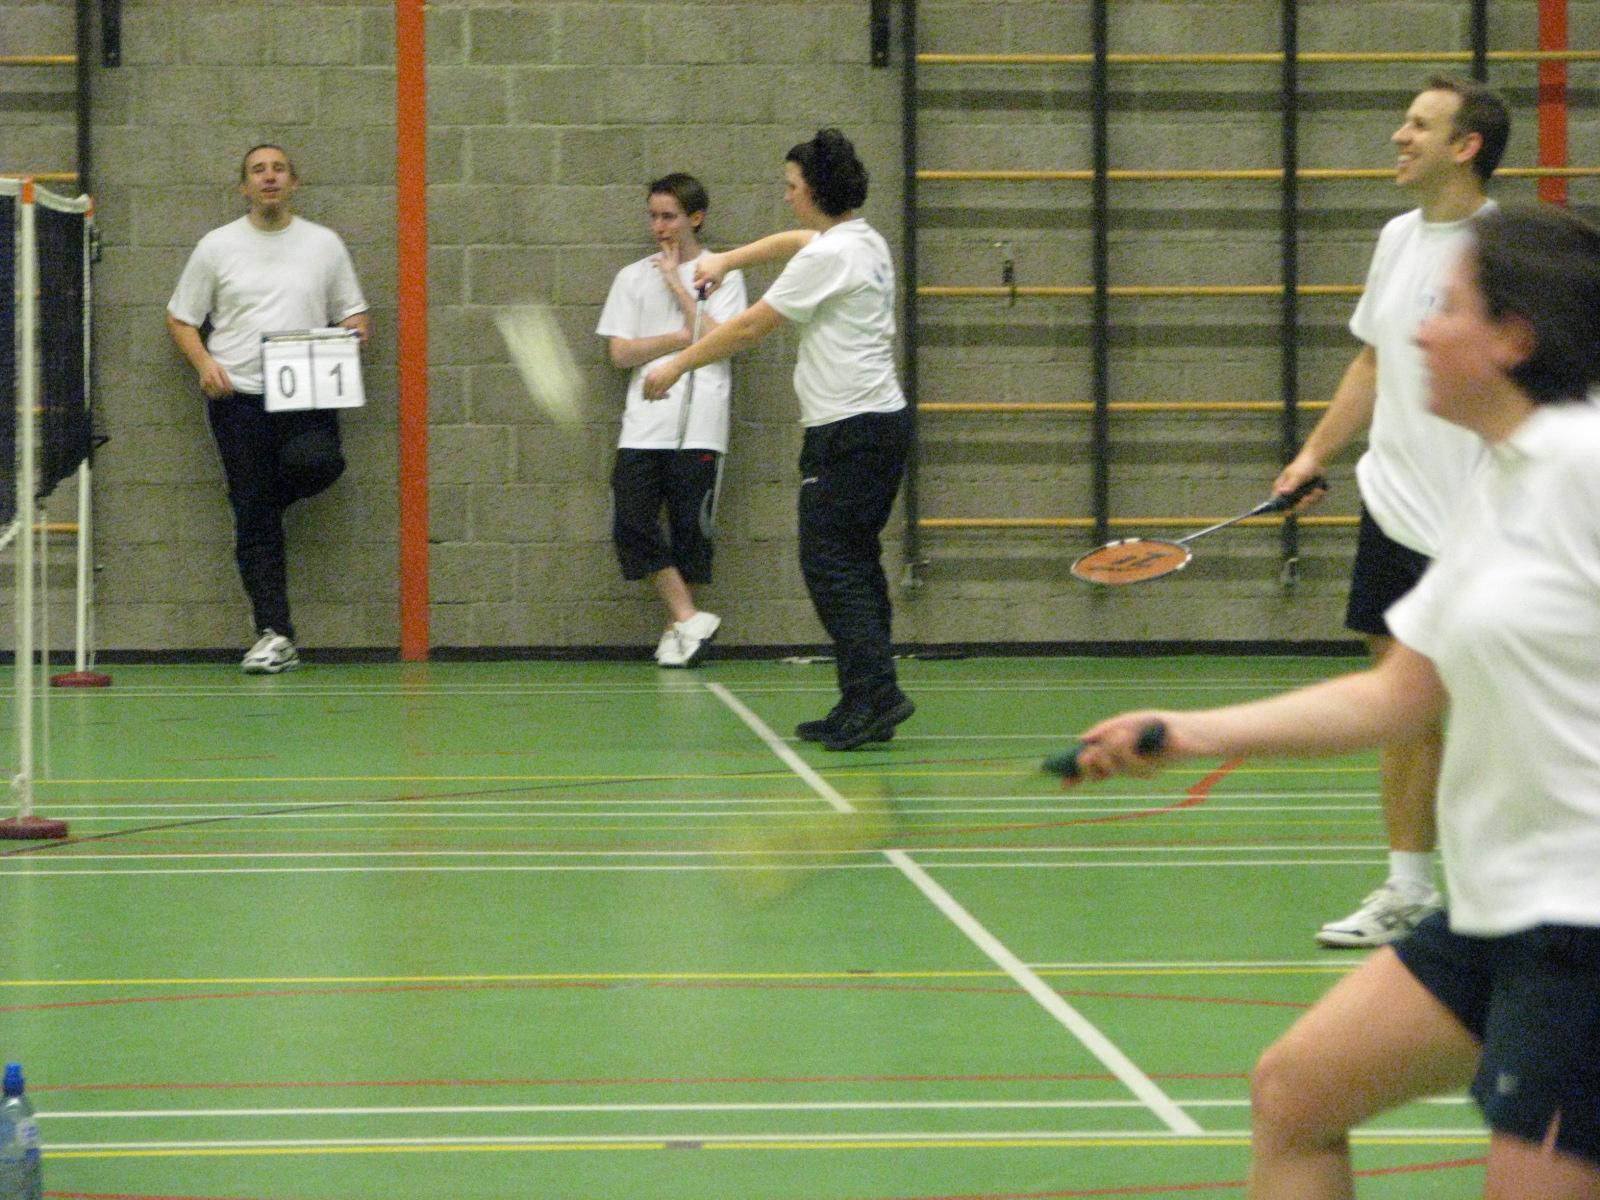 Competitie foto's – Badminton Club Nuenen Badminton Nederland Competitie